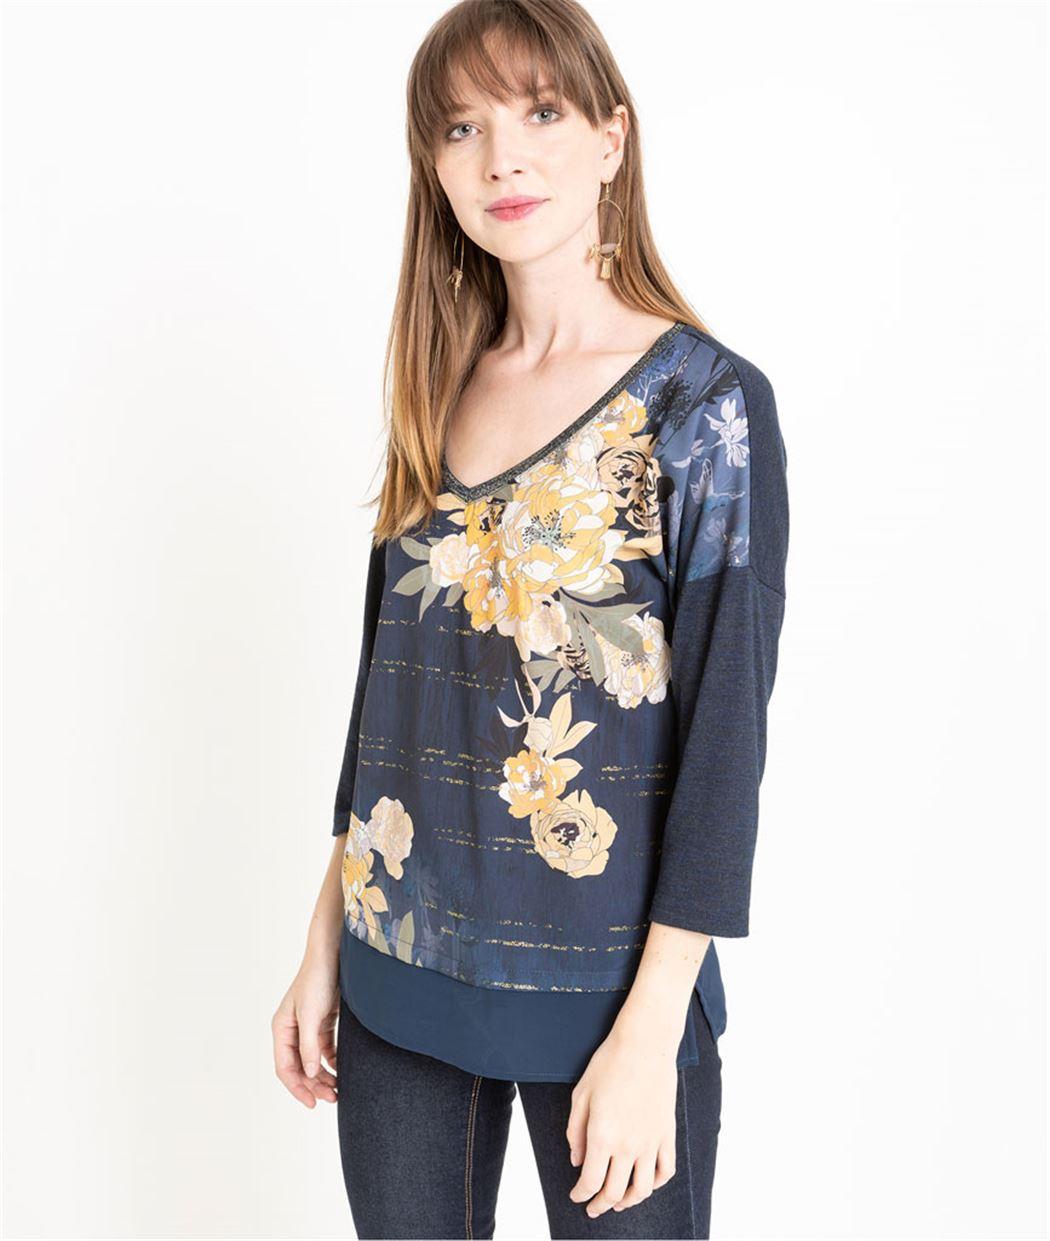 T-shirt femme manches 3/4 imprimé fleuri MARINE